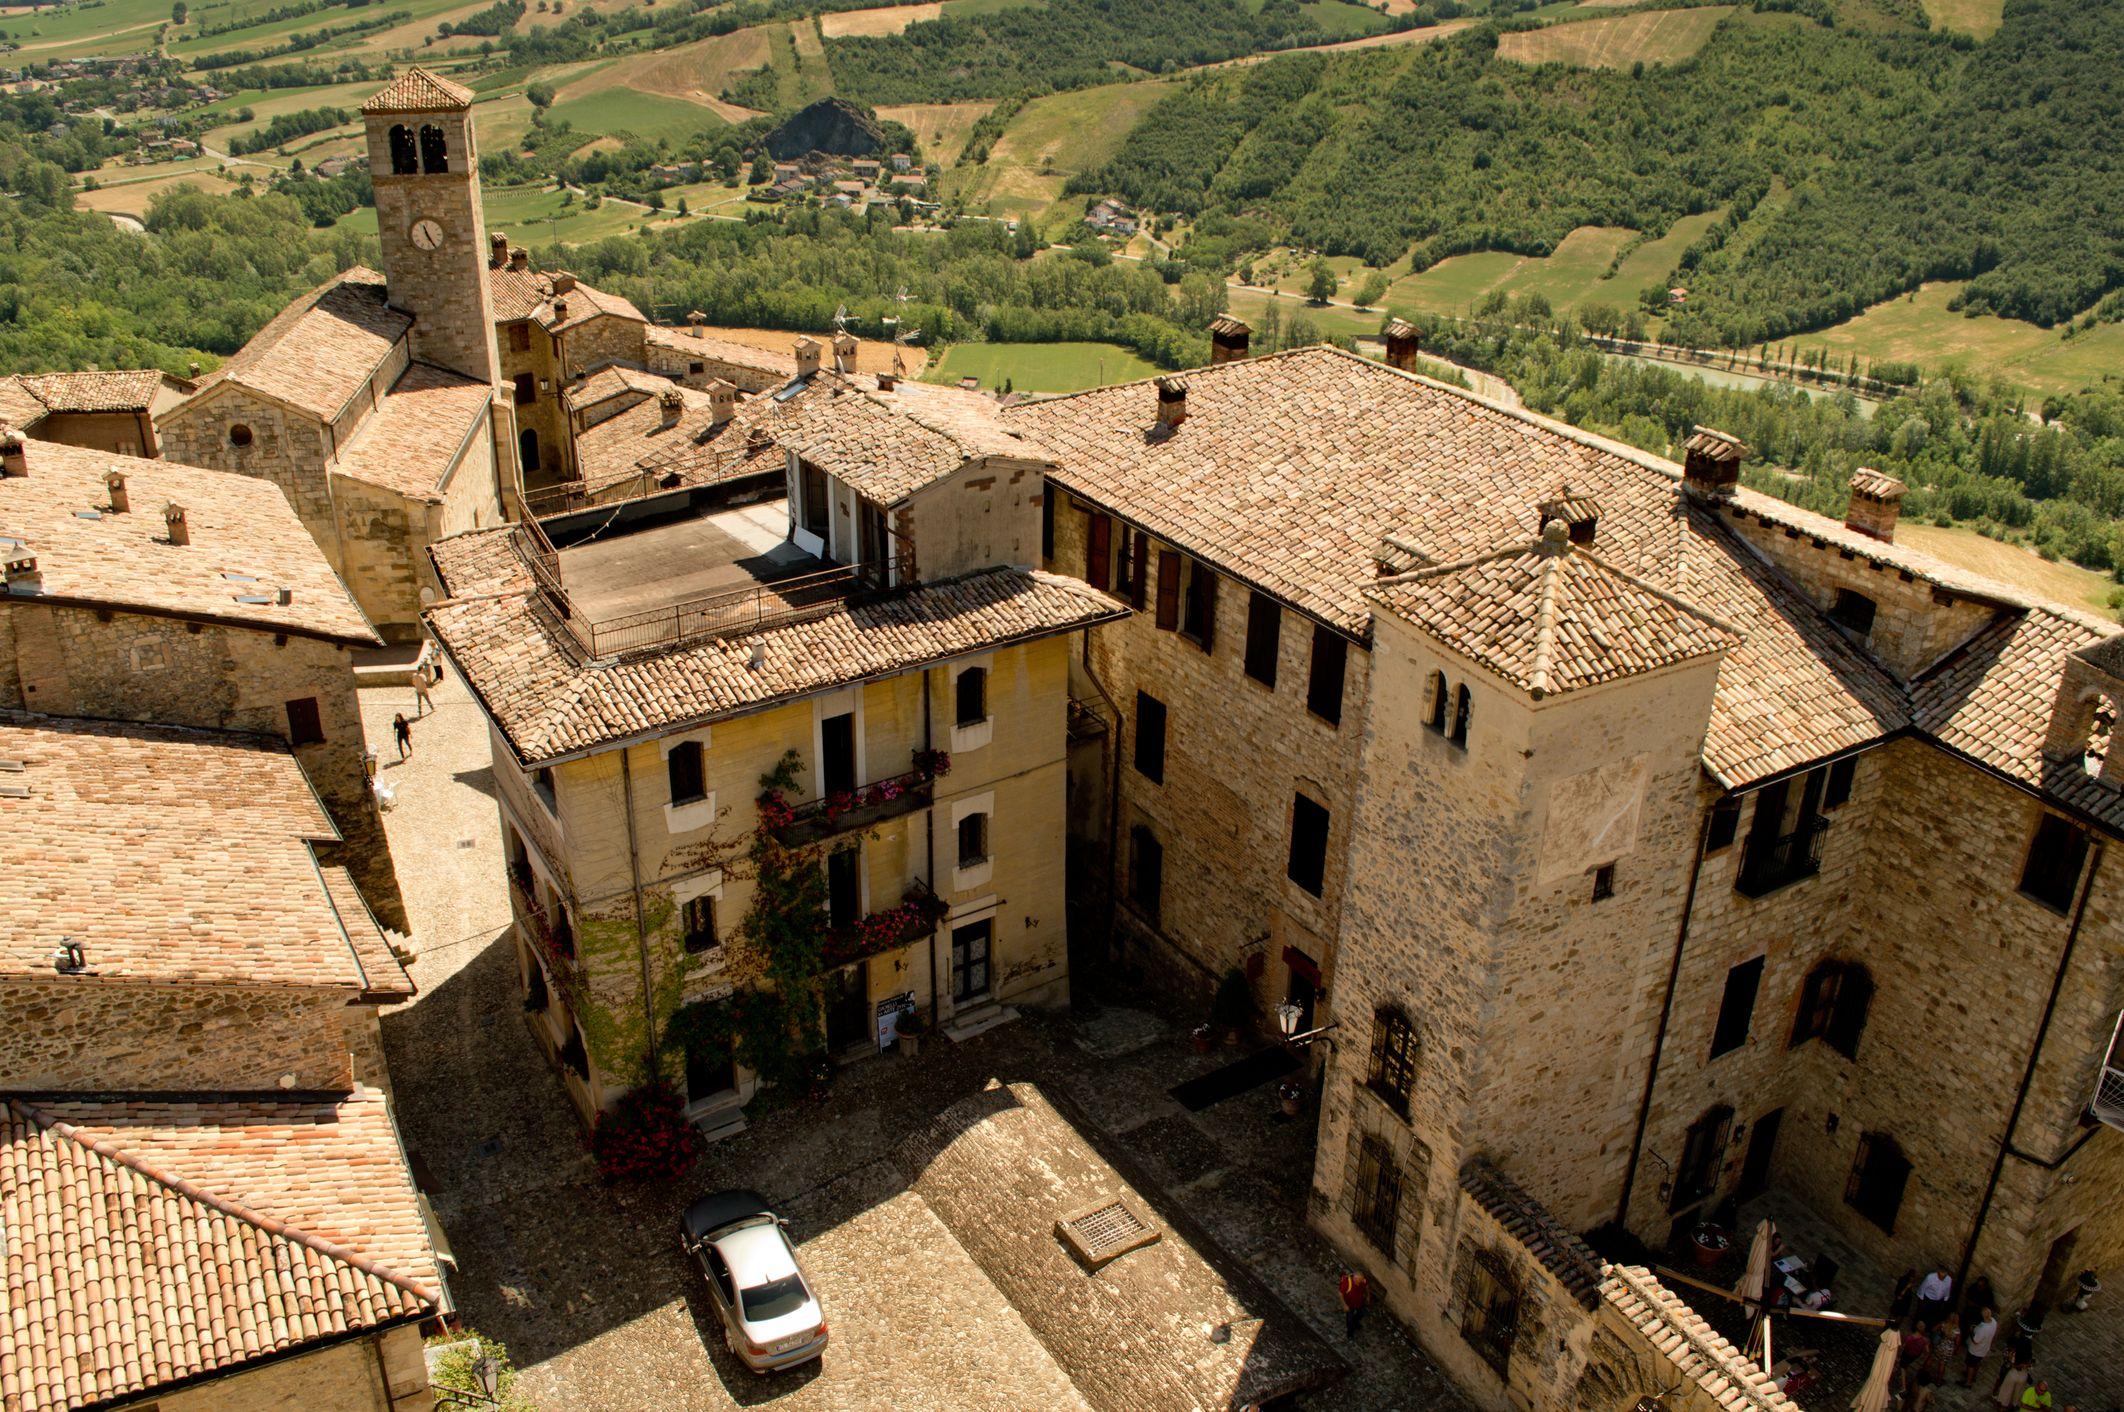 Build Your Own Italian Luxury Getaway Trazee Travel Luxury Getaway Italian Countryside Italian Luxury